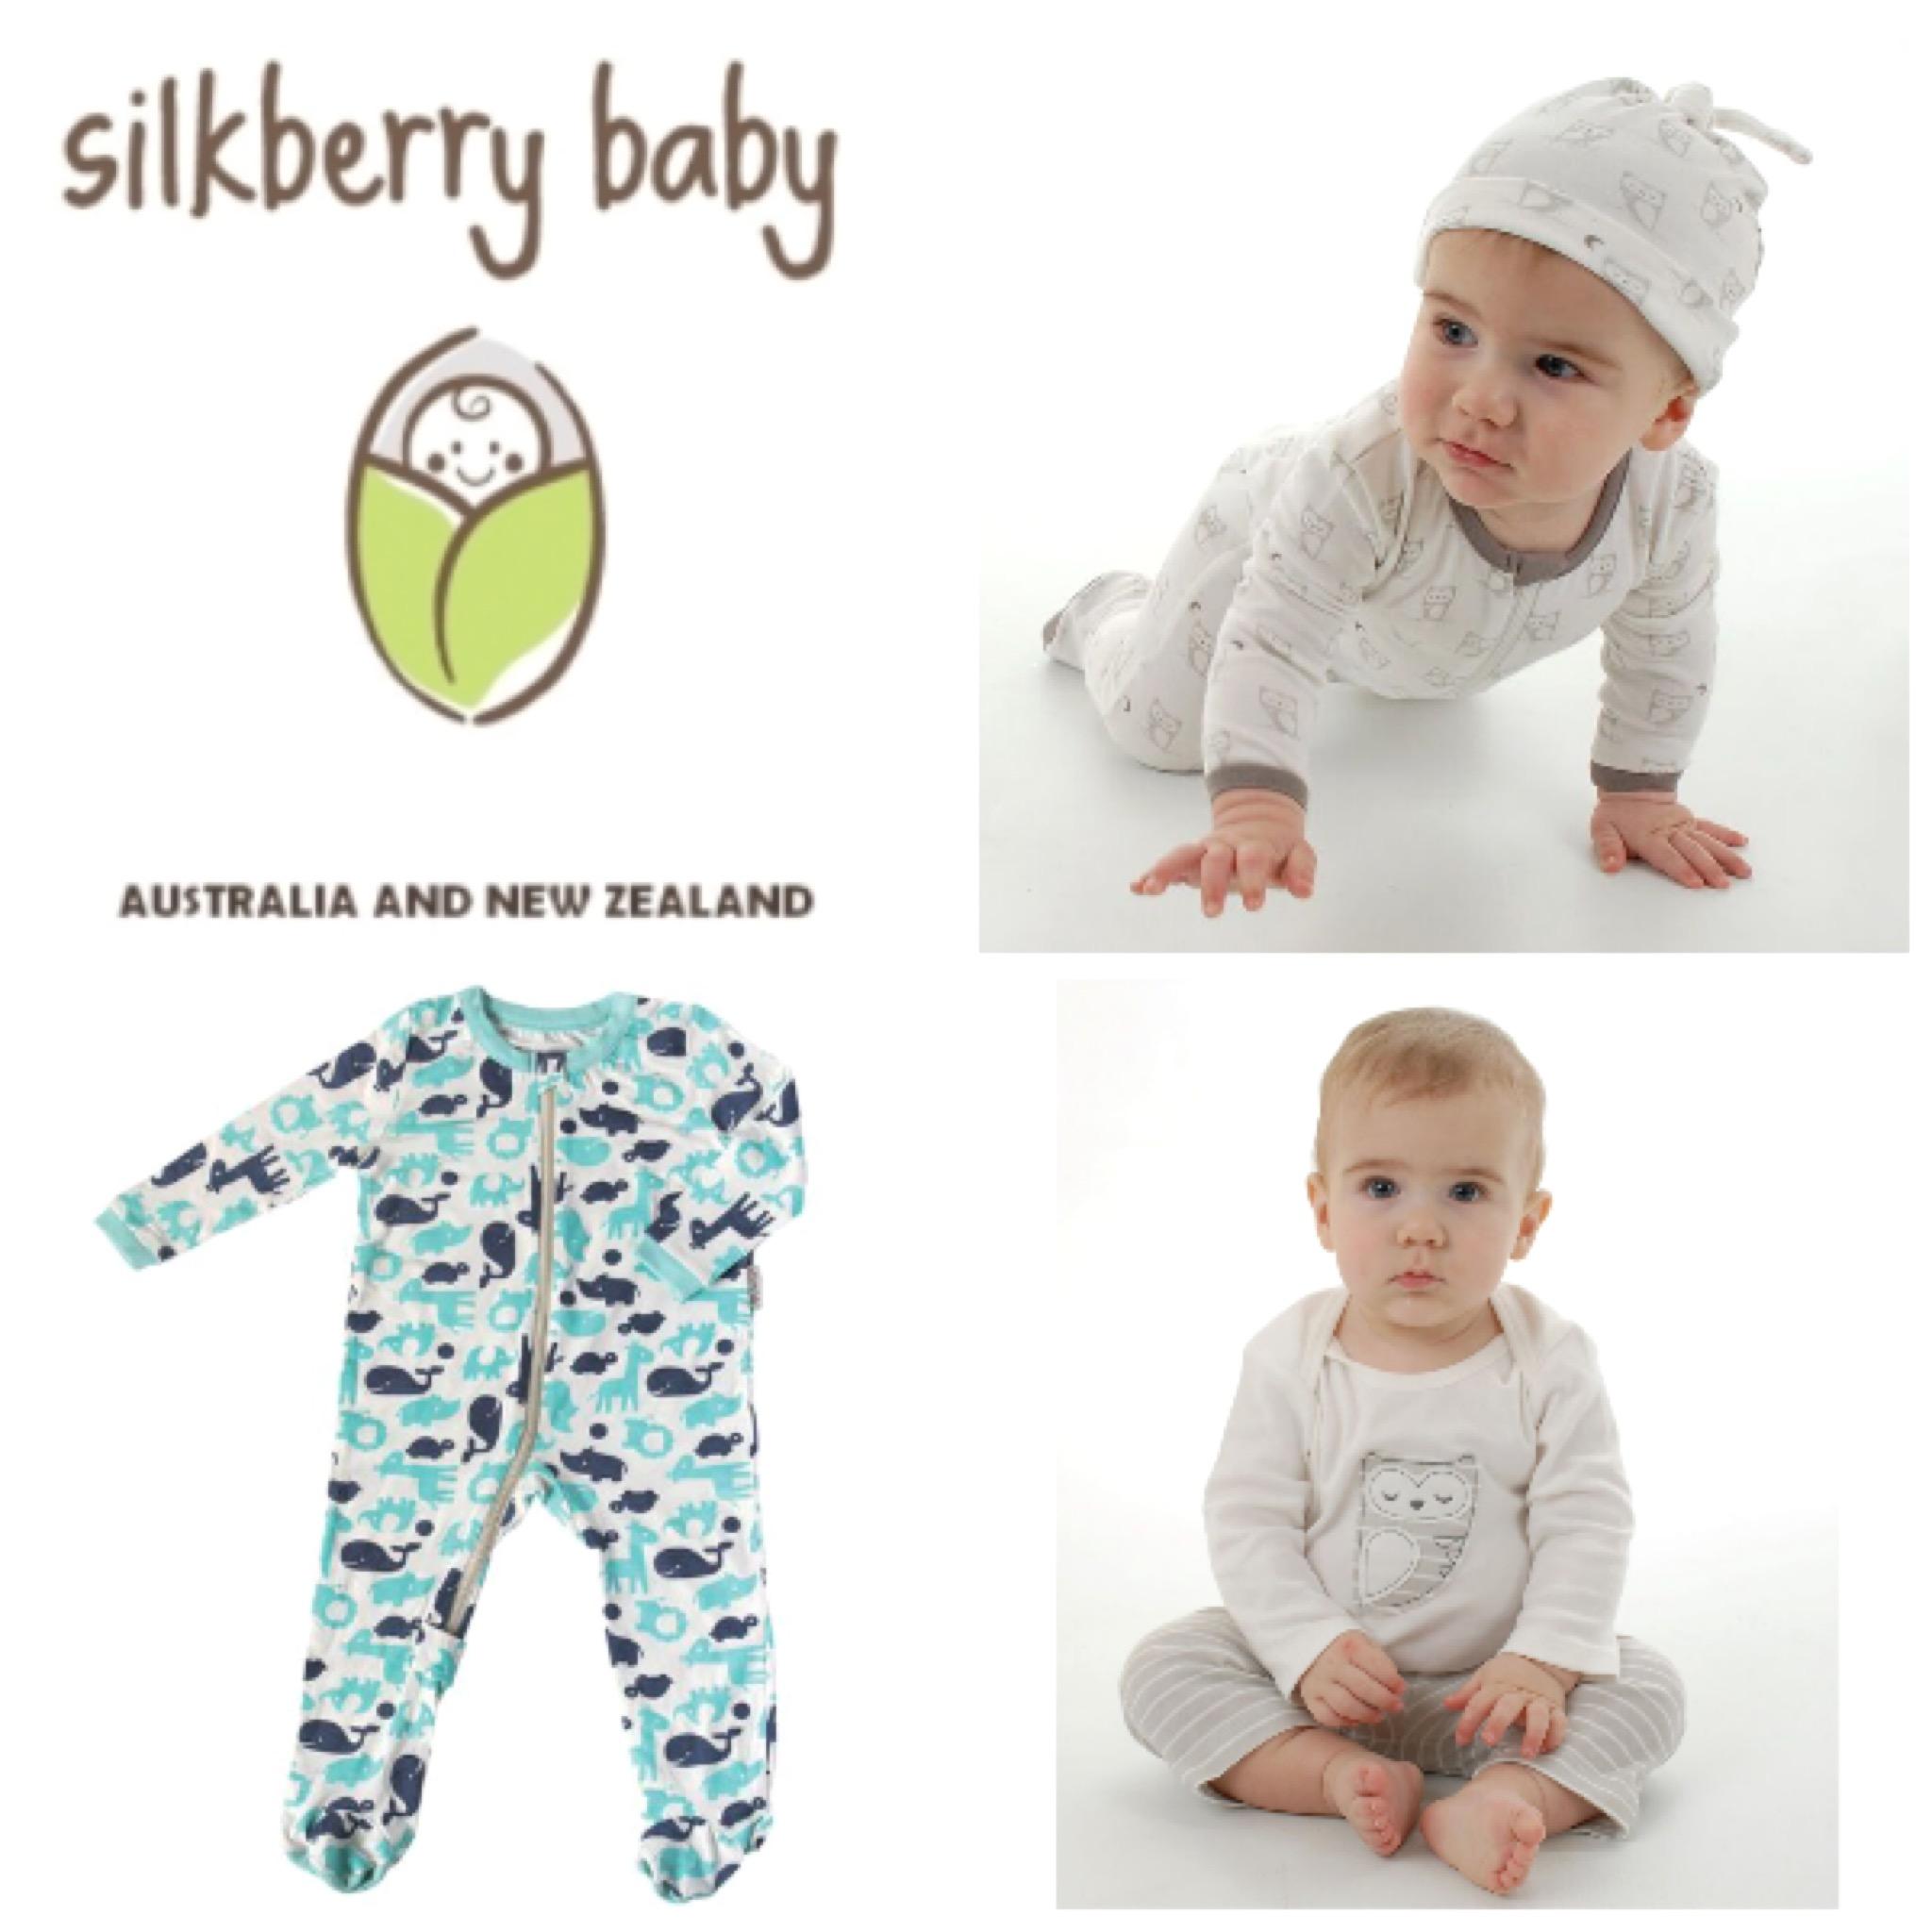 Silkberry Baby